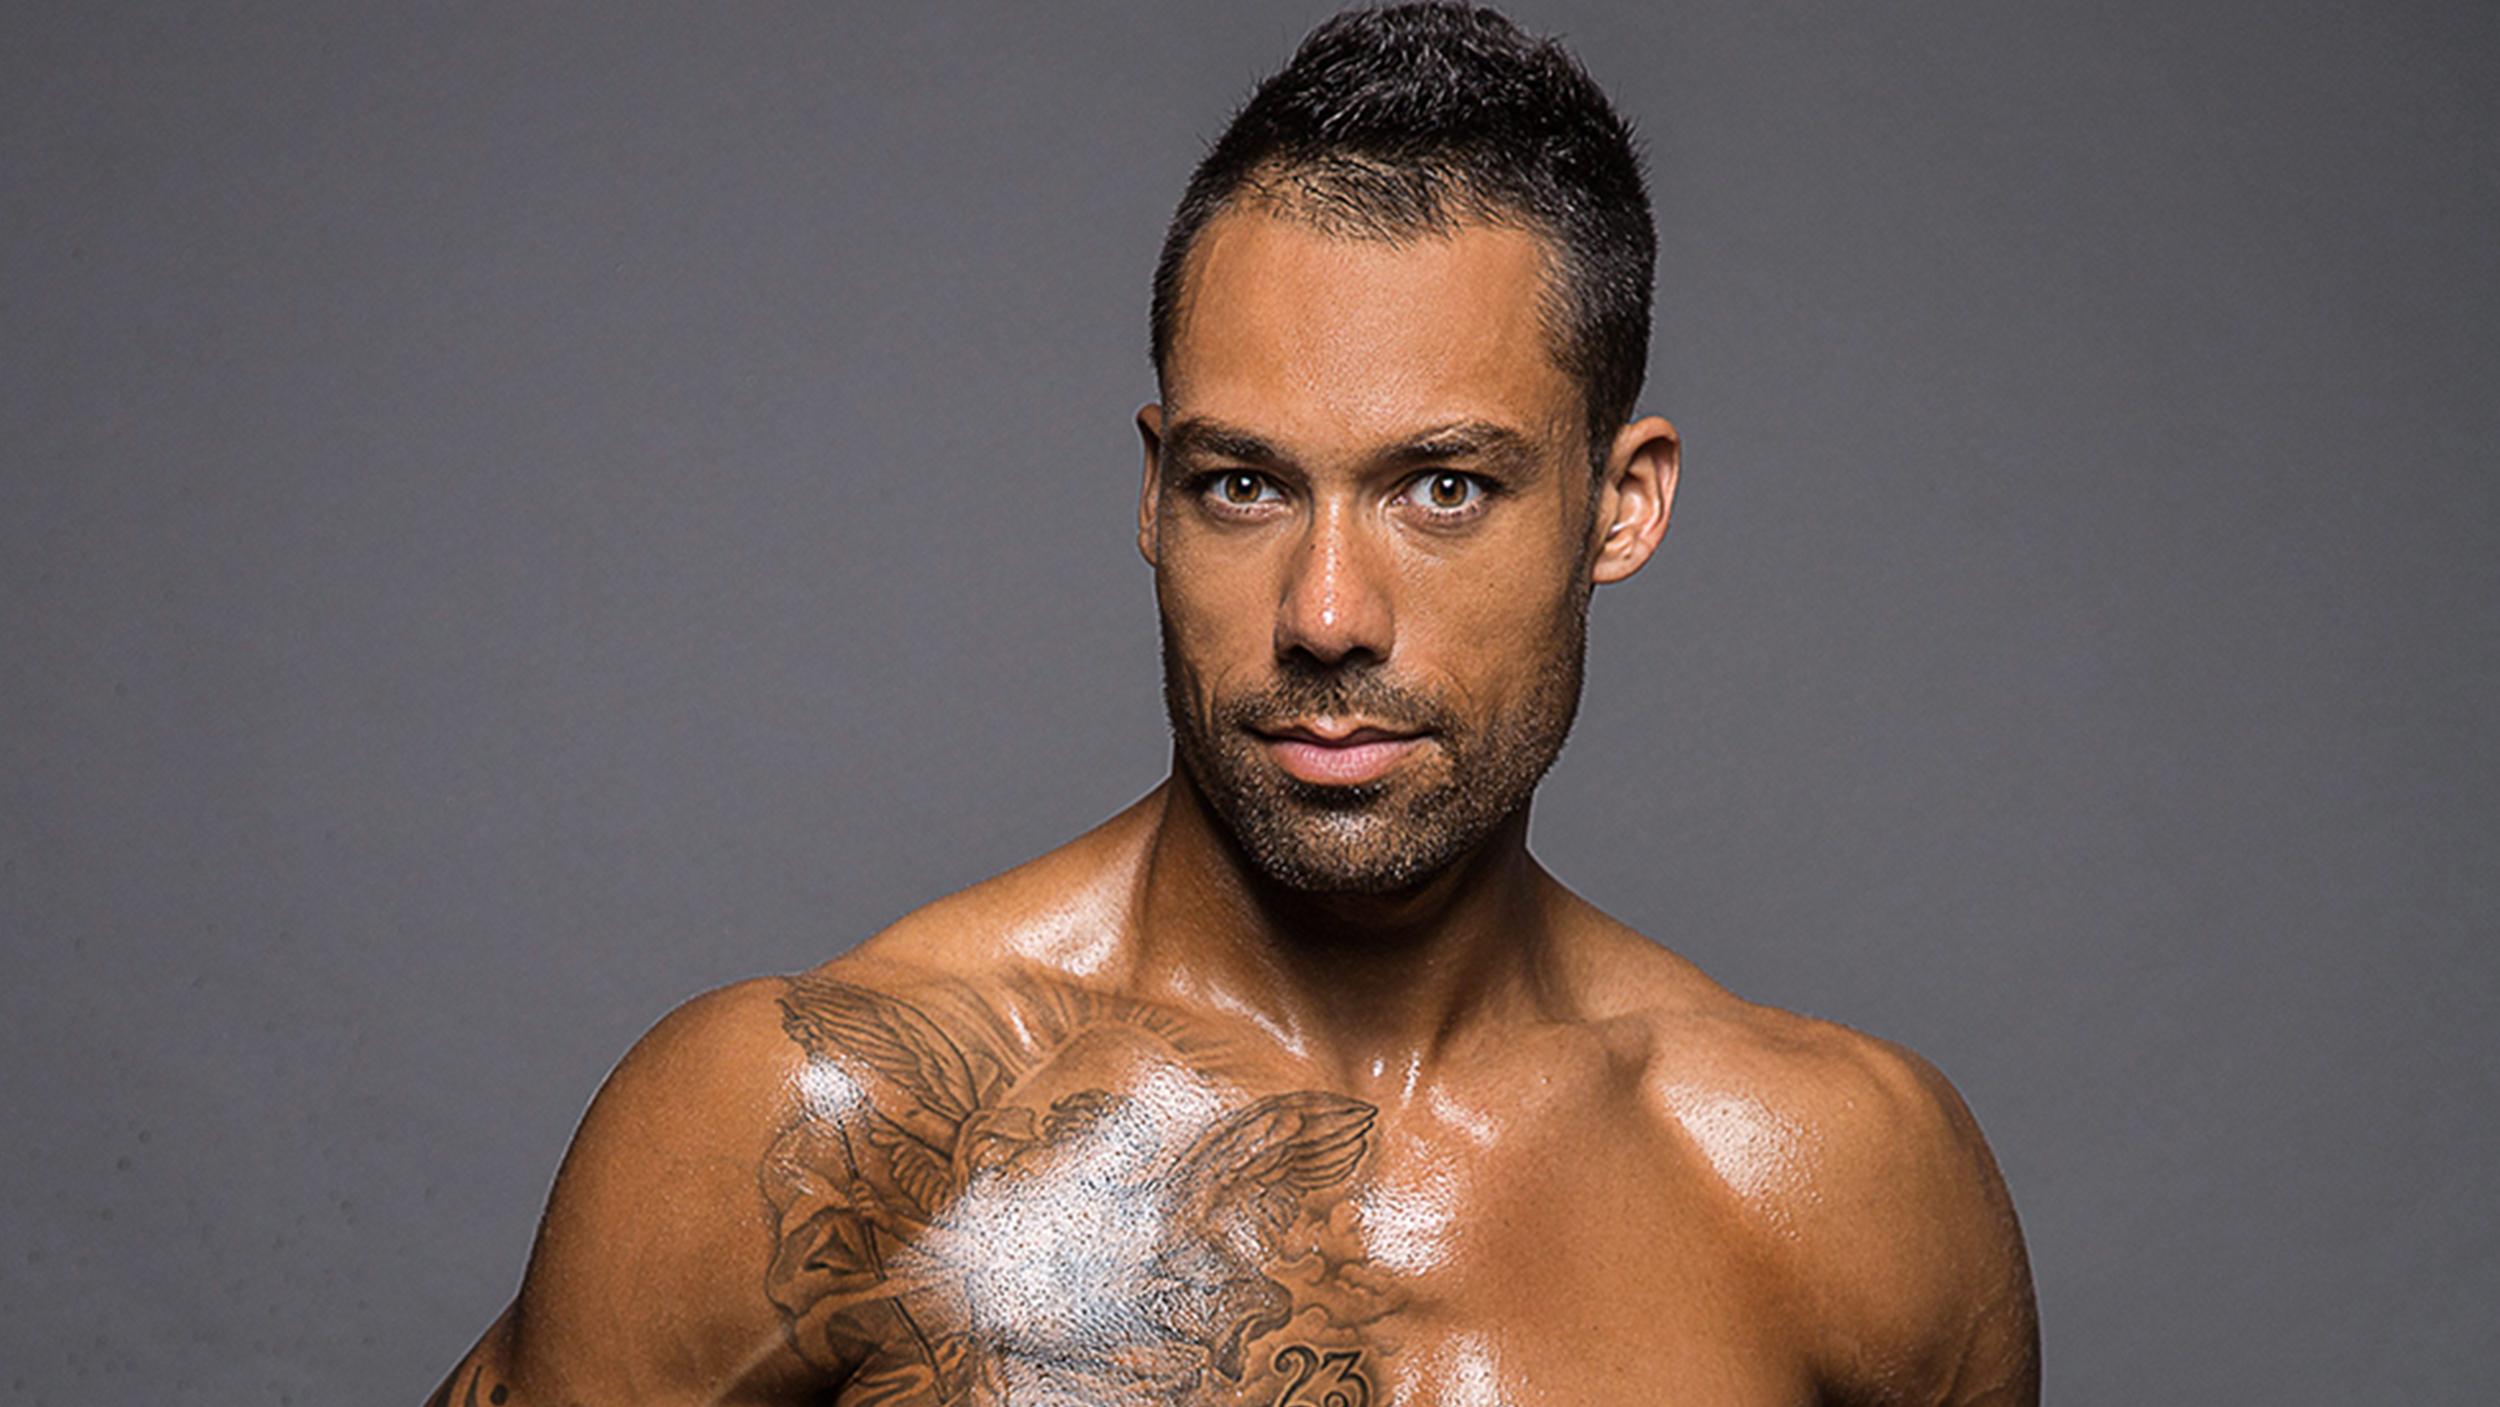 Male model Blake Beckford poses shirtless with ileostomy